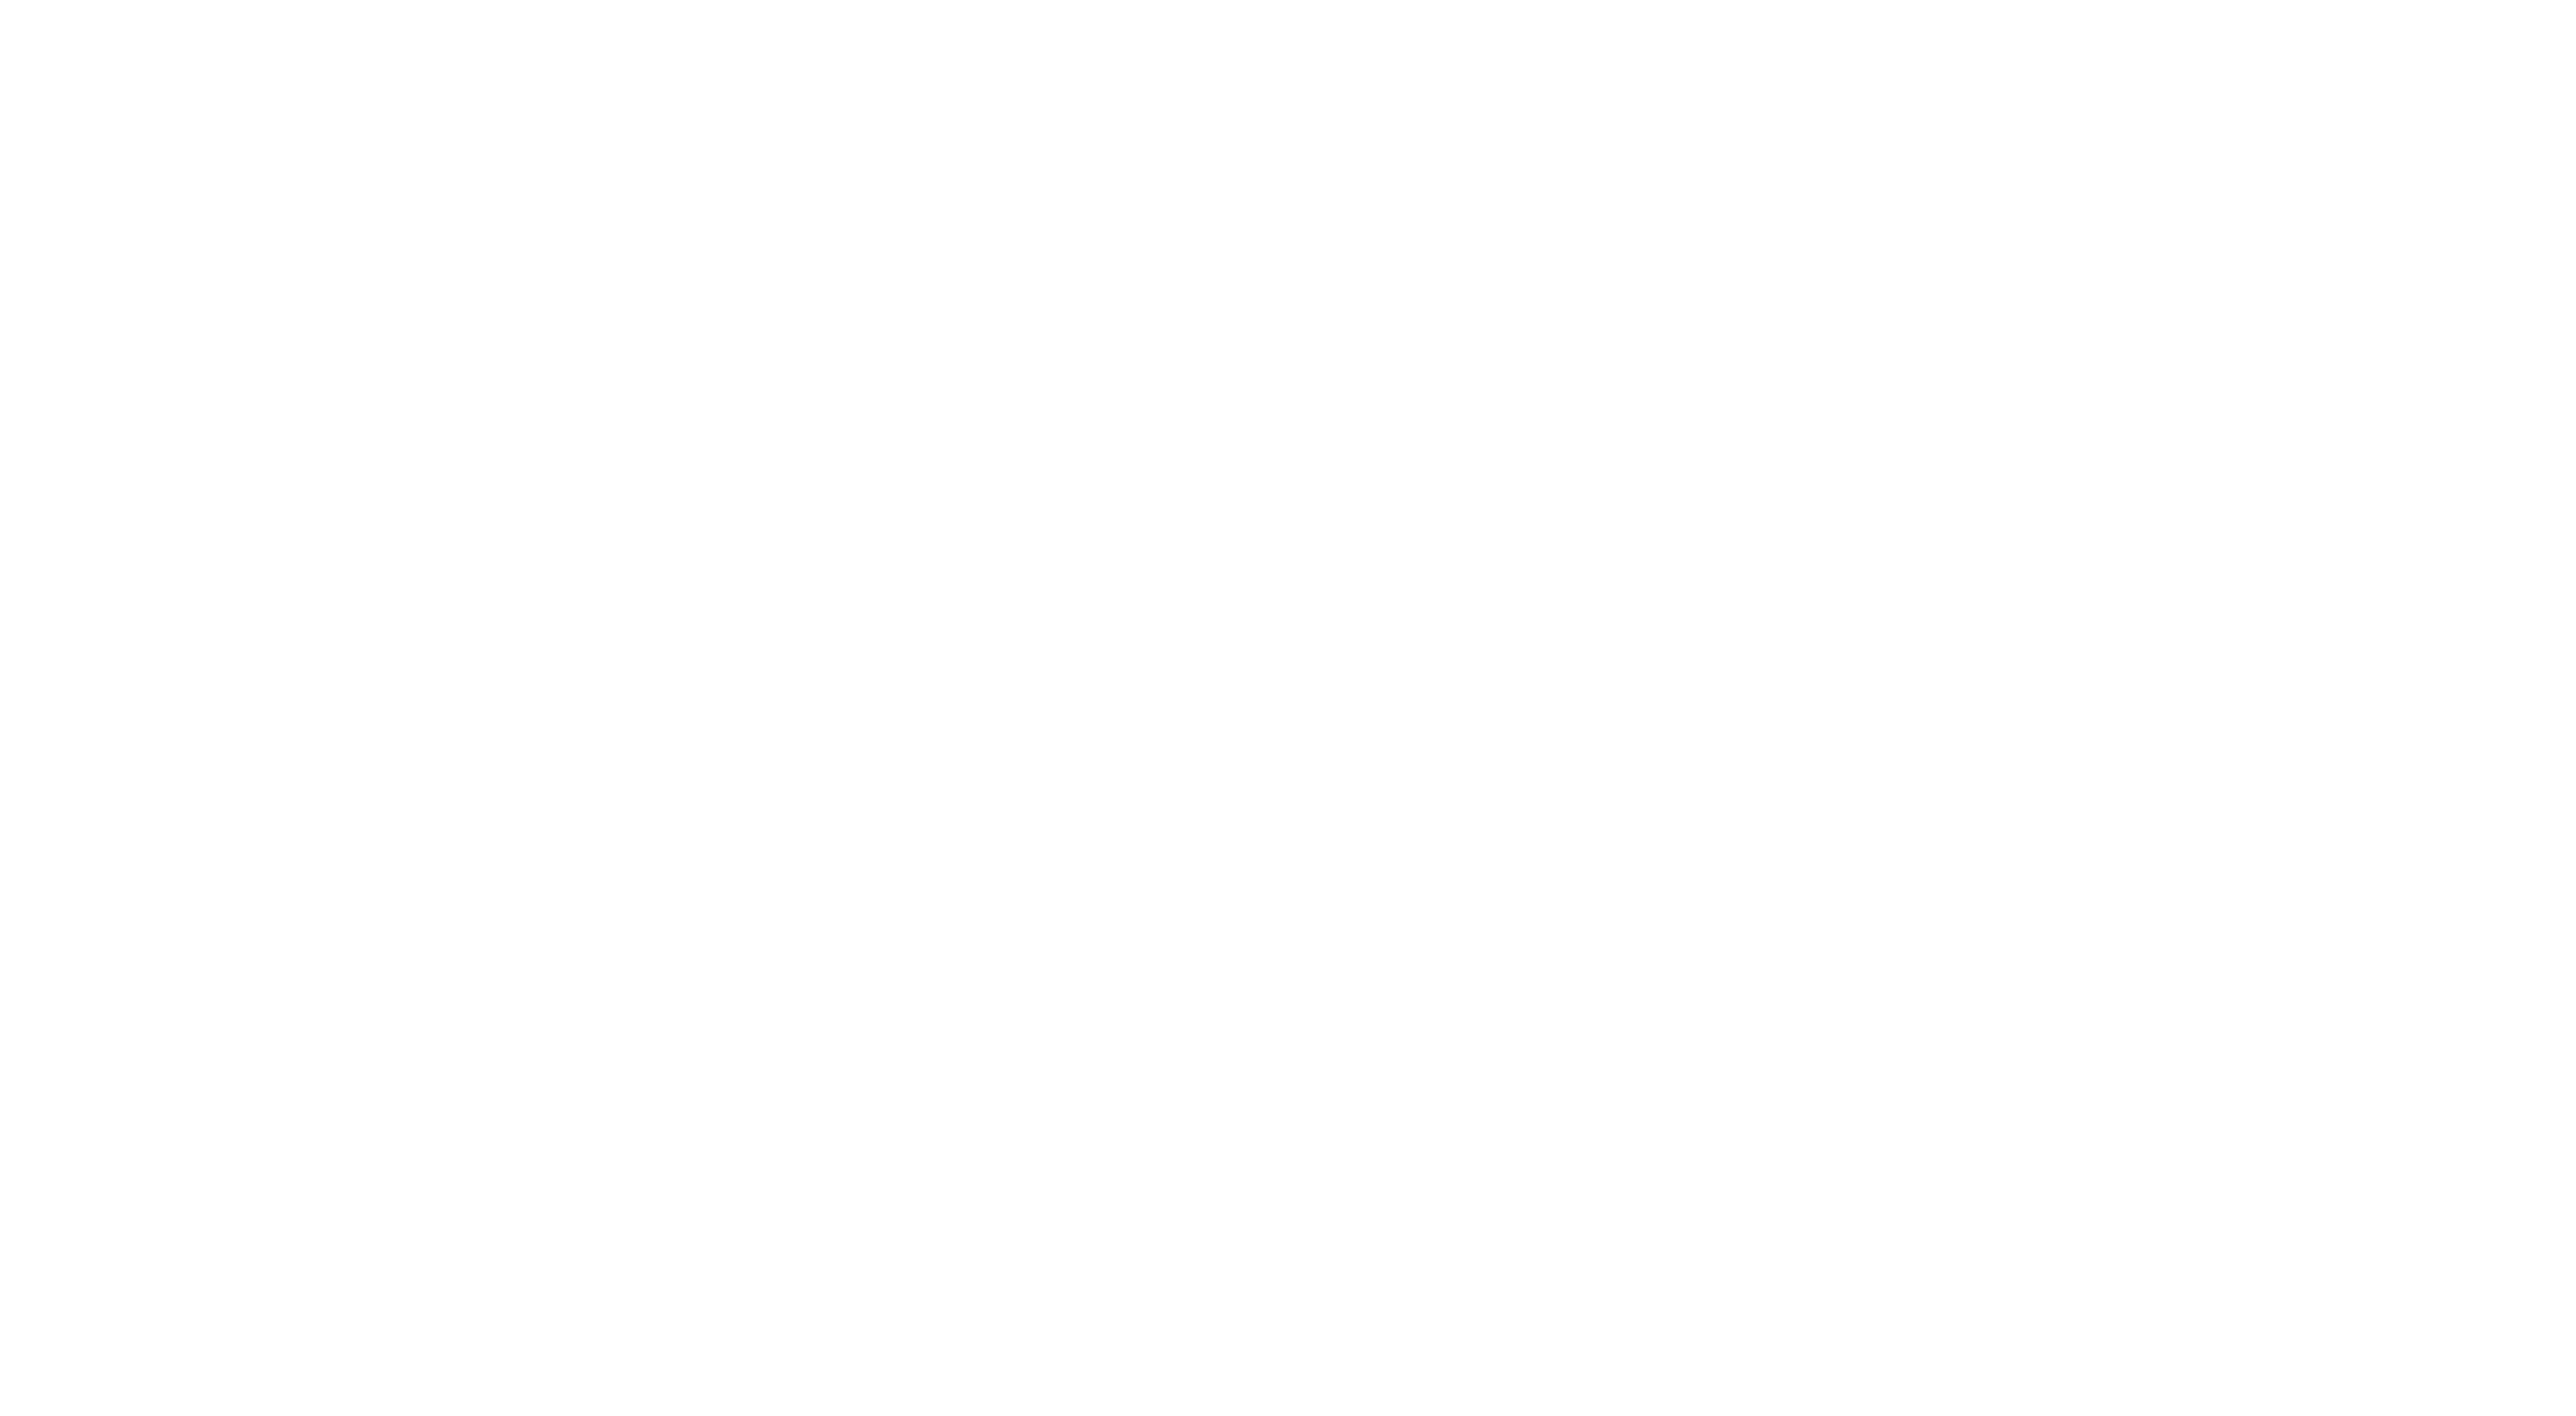 Derivatives of Phenethyl Alcohols